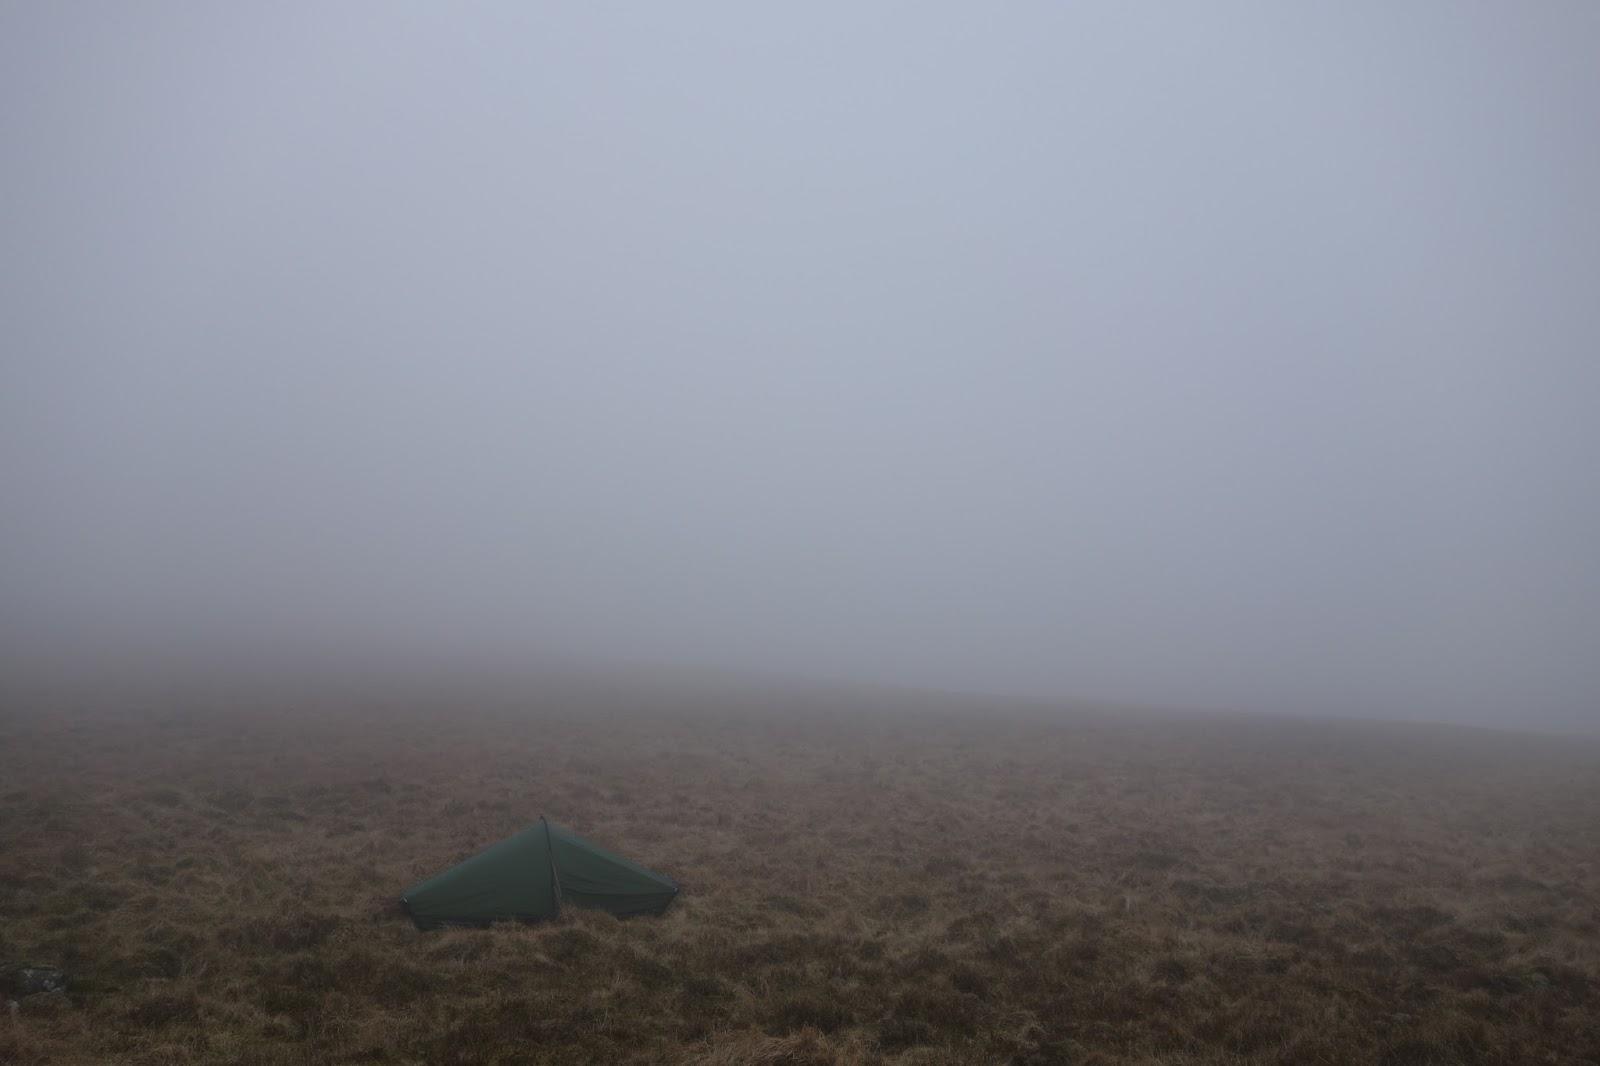 Tent in hill fog in Snowdonia